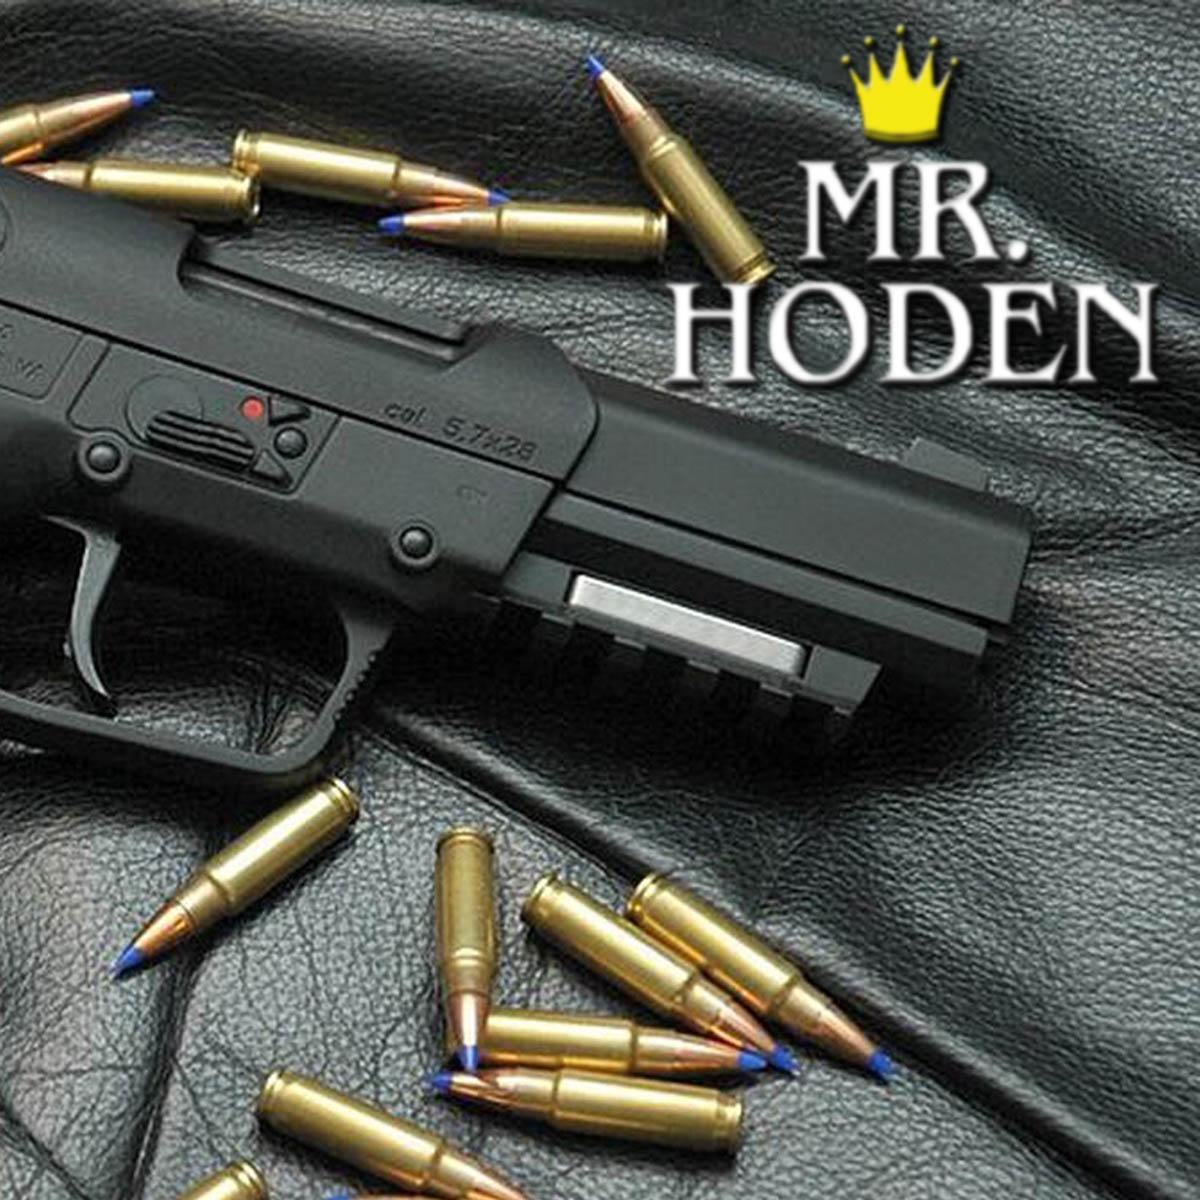 Upcoming: Mr. Hoden - Hard Banger Rap Beat 2019 [FREE BEAT]